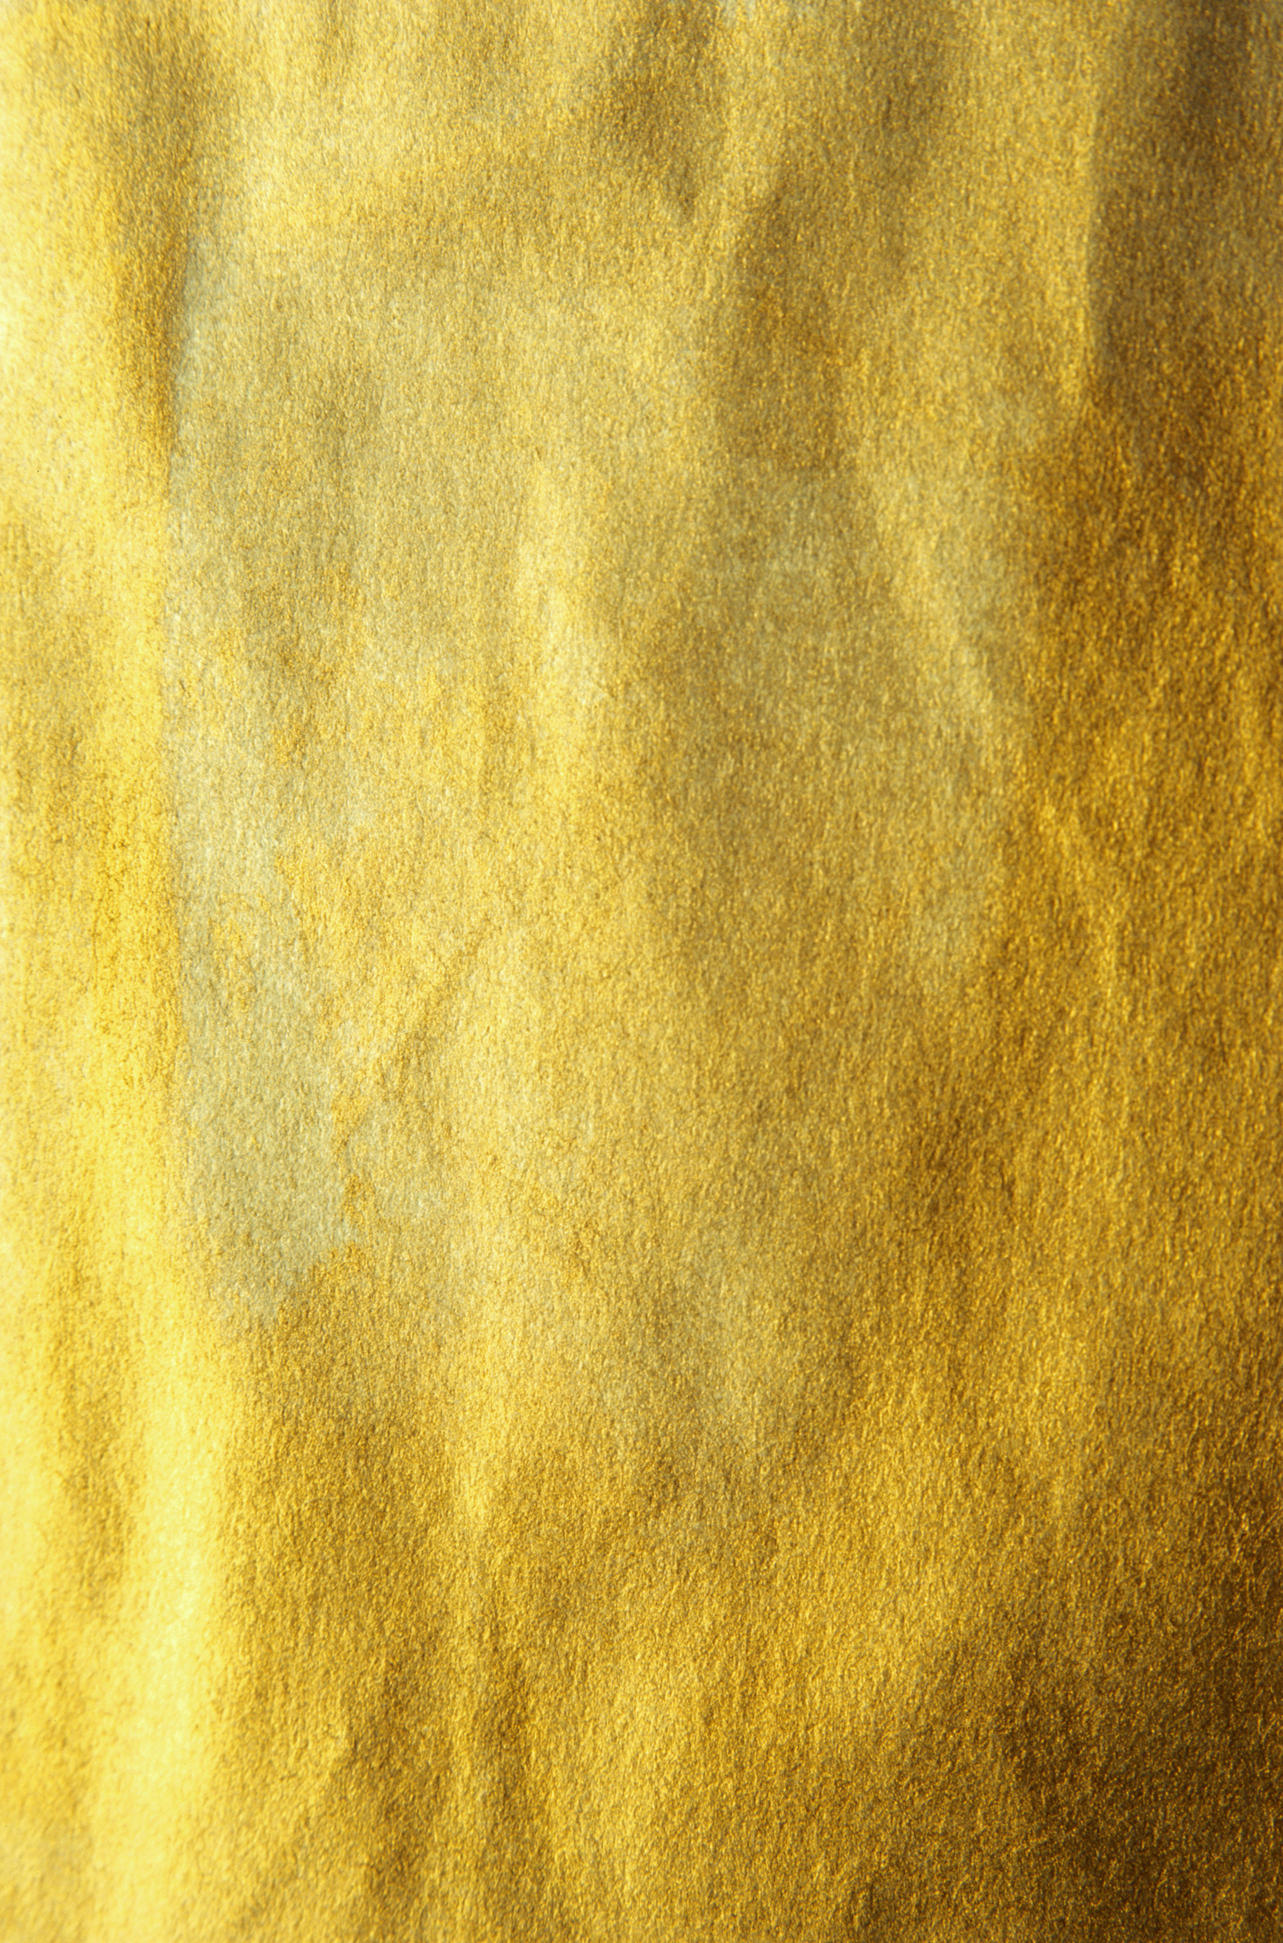 Texture 06 by Wu-KillahD